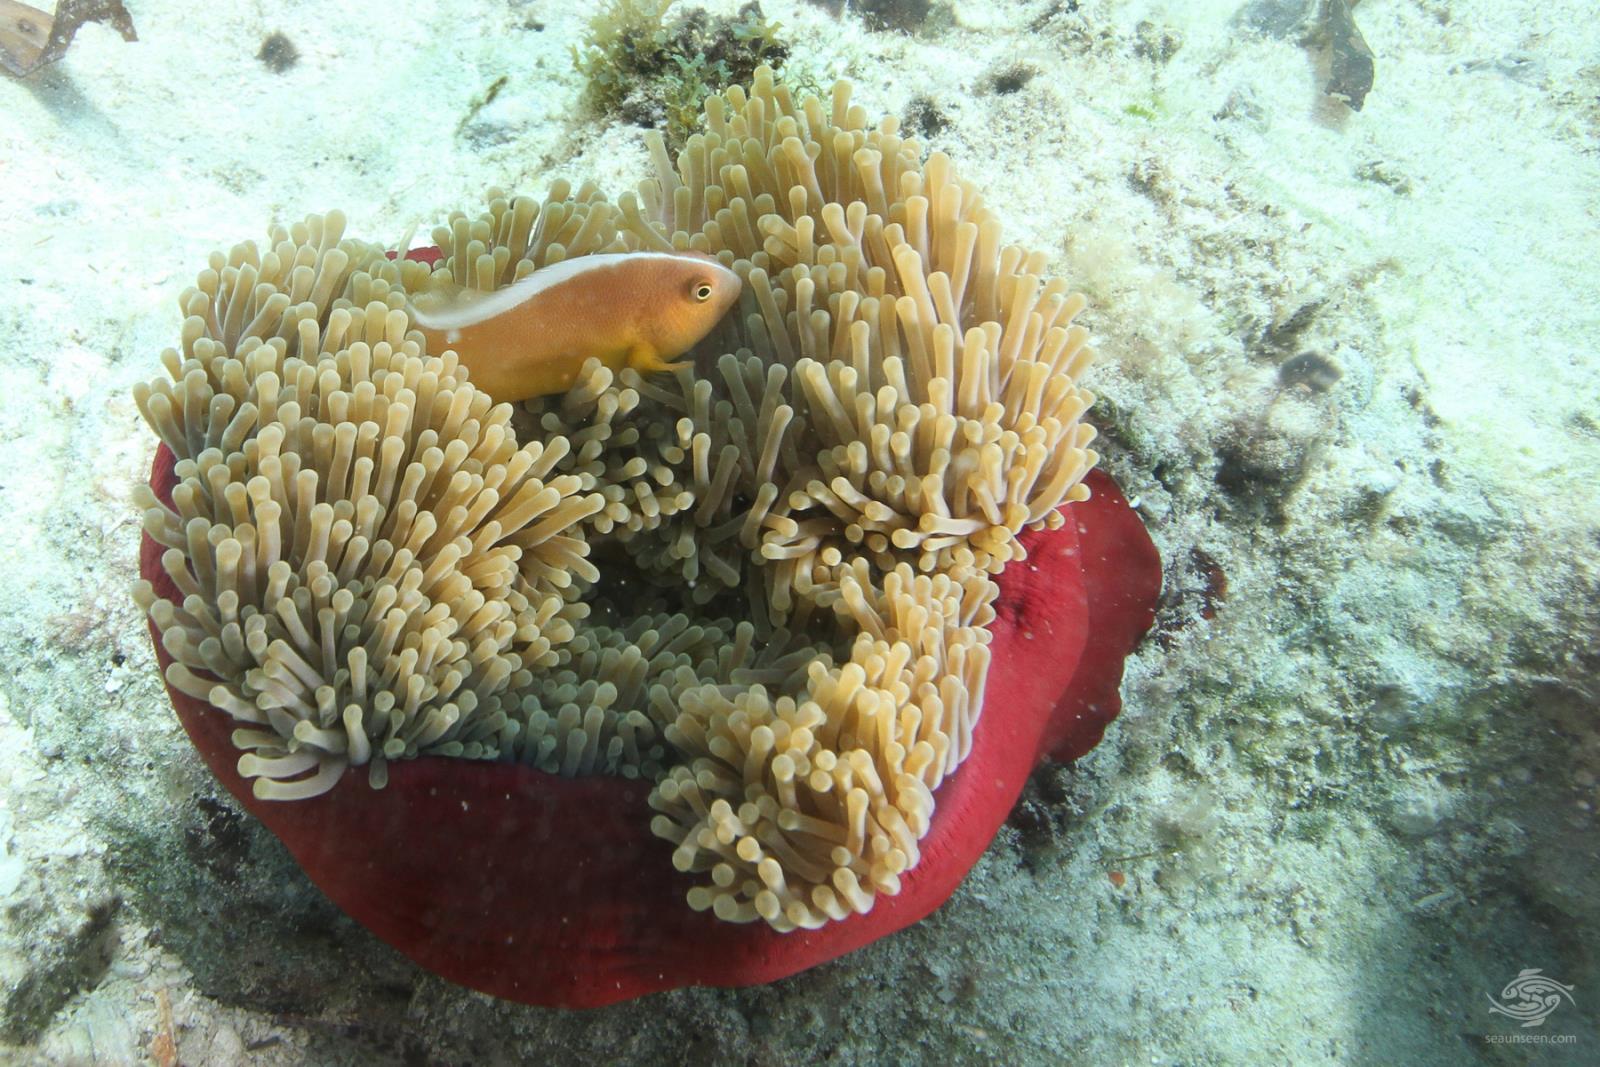 Skunk clownfish or nosestripe anemonefish Amphiprion akallopisos Tanzania 2